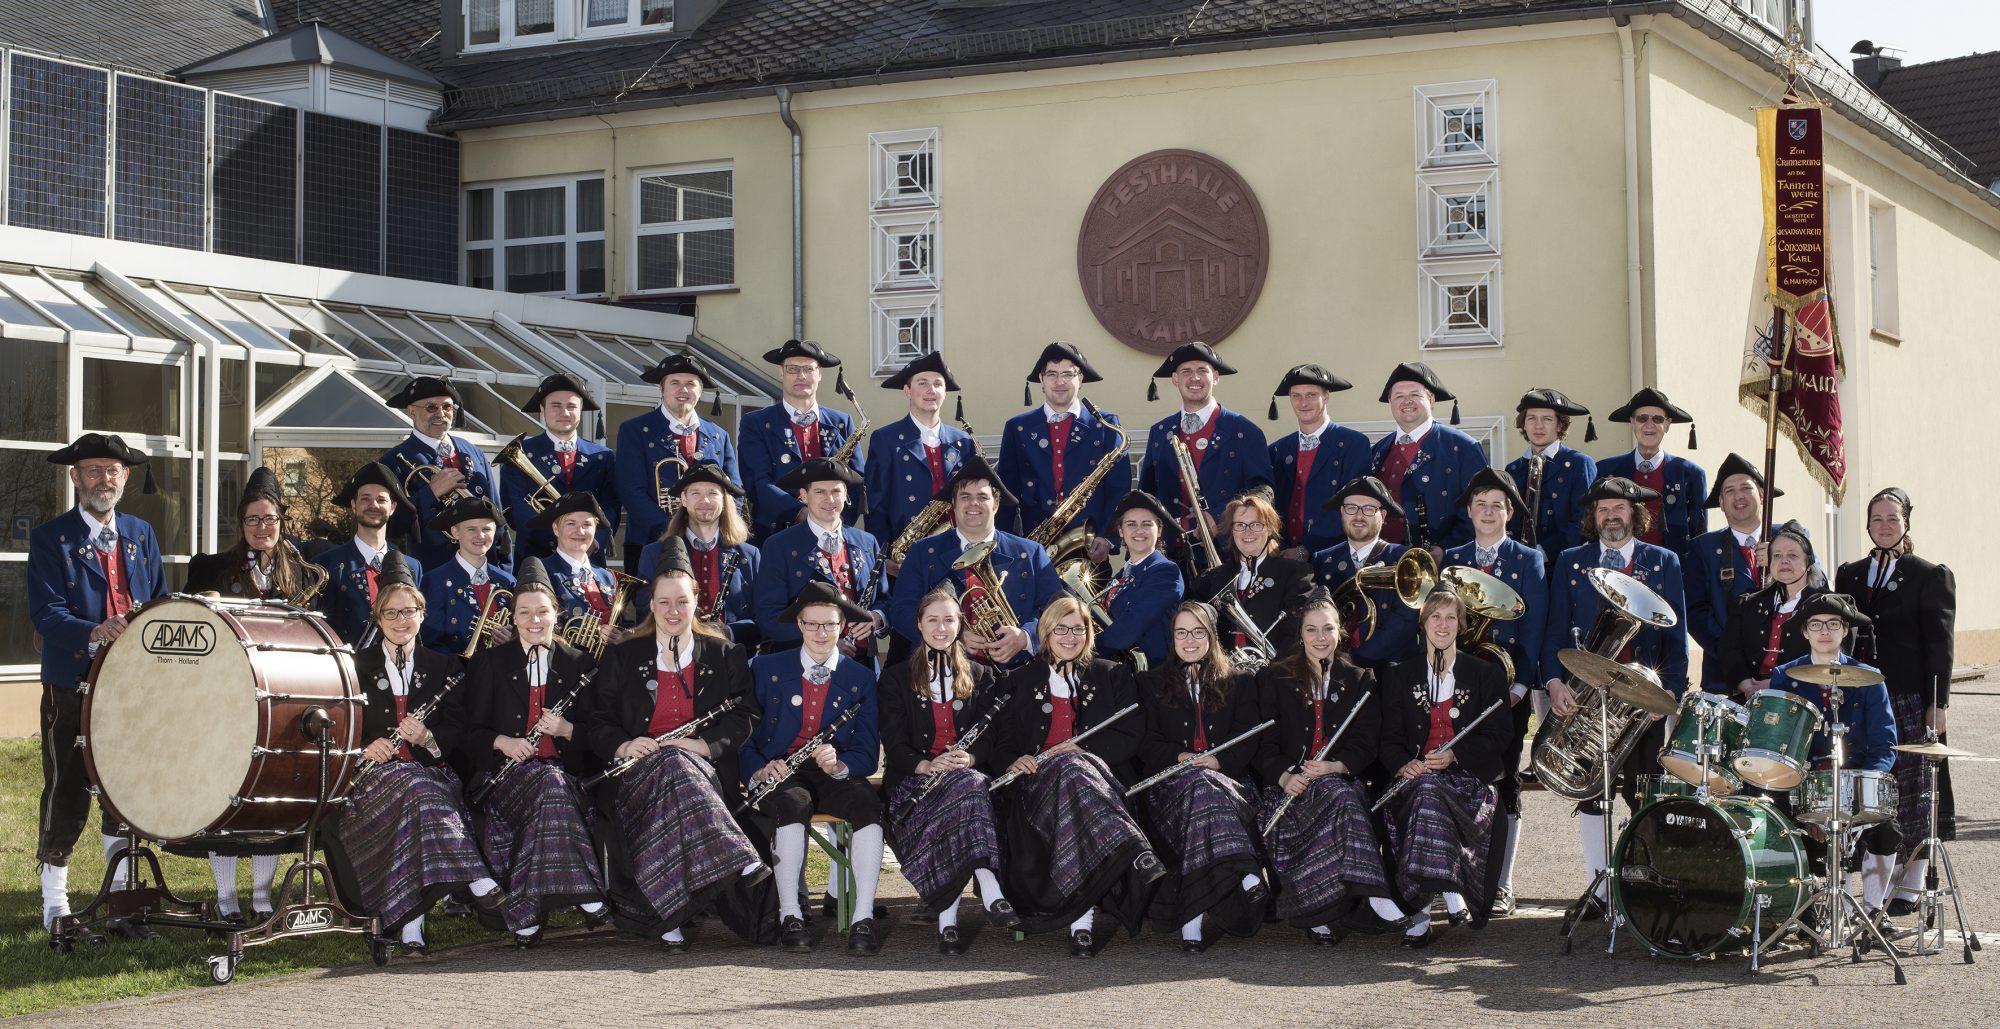 Musikverein Kahl am Main